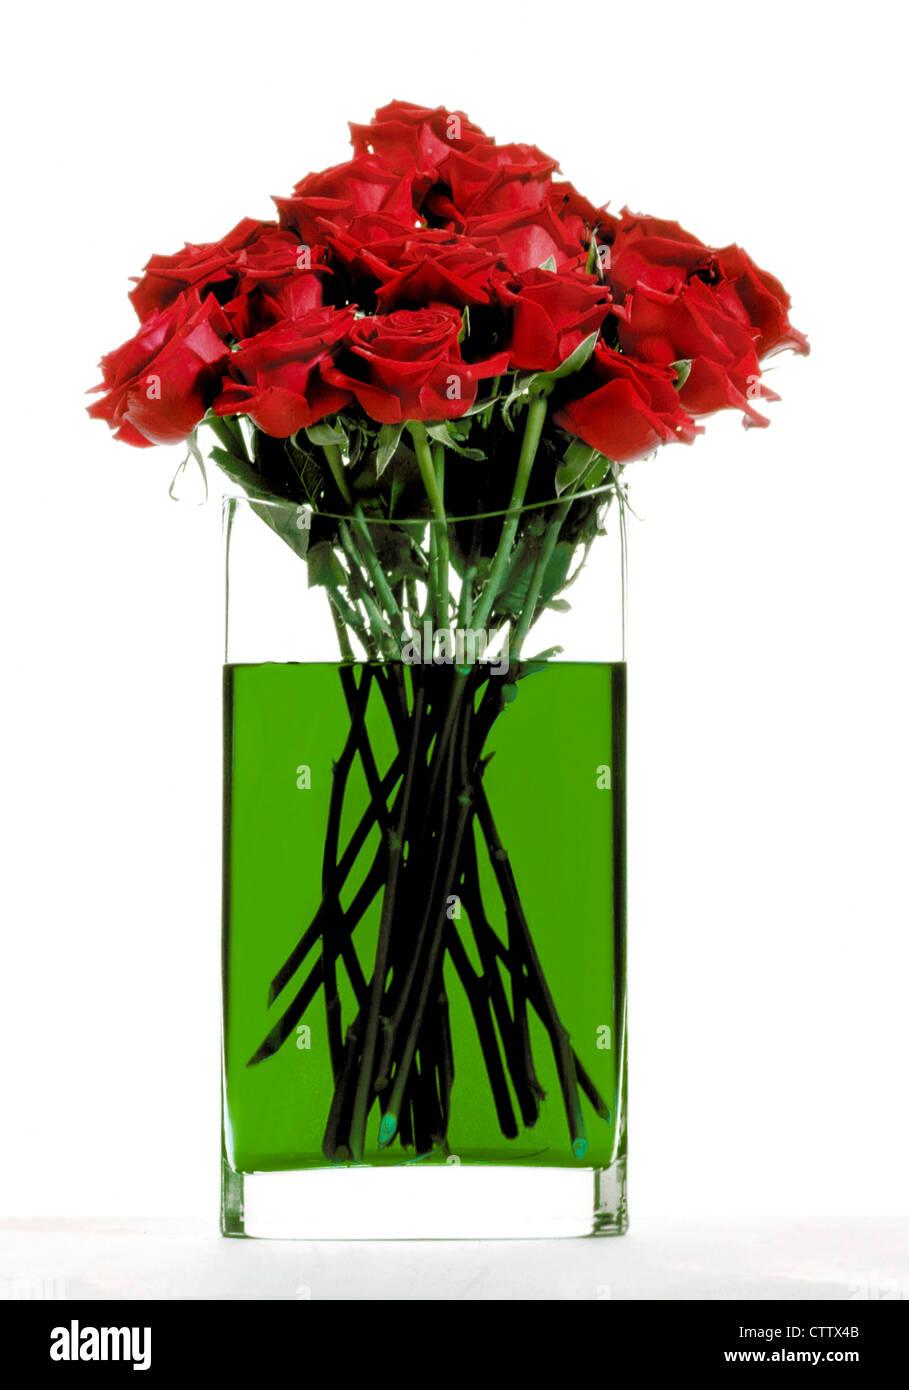 Red roses in green water - Rote Rosen in grünem Blumenwasser in Glasvase, Freisteller - Stock Image